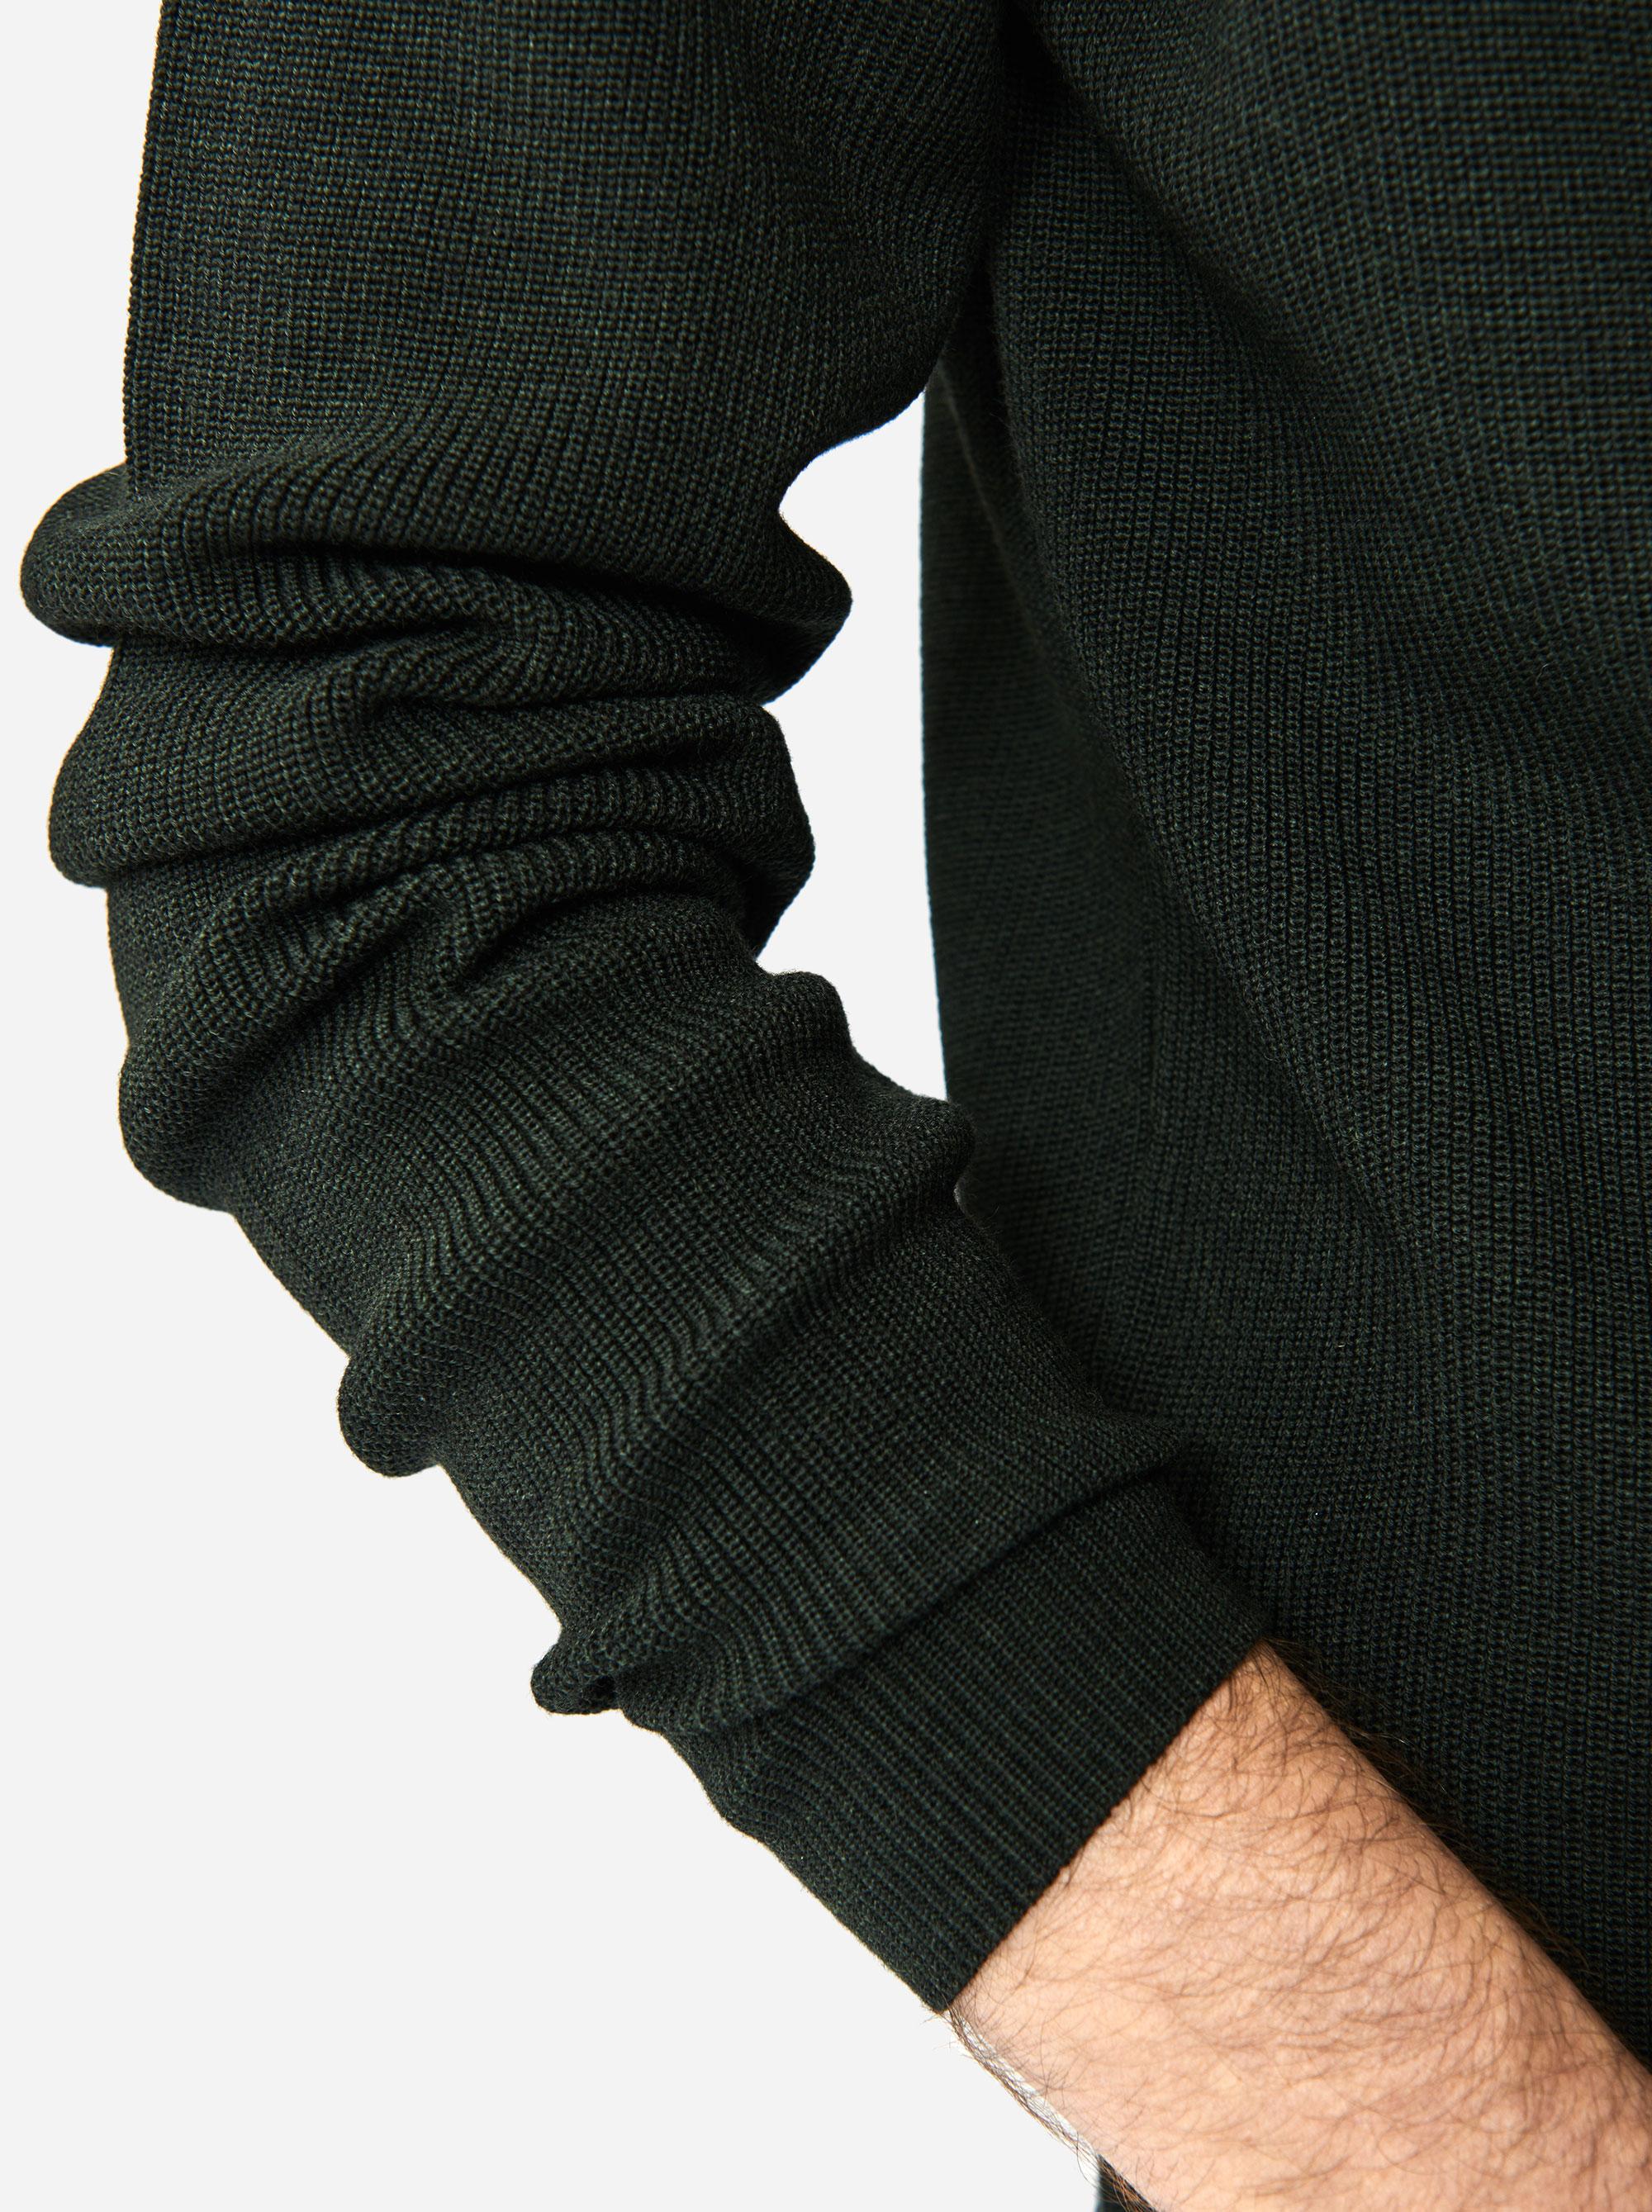 Teym - Turtleneck - The Merino Sweater - Men - Green - 4